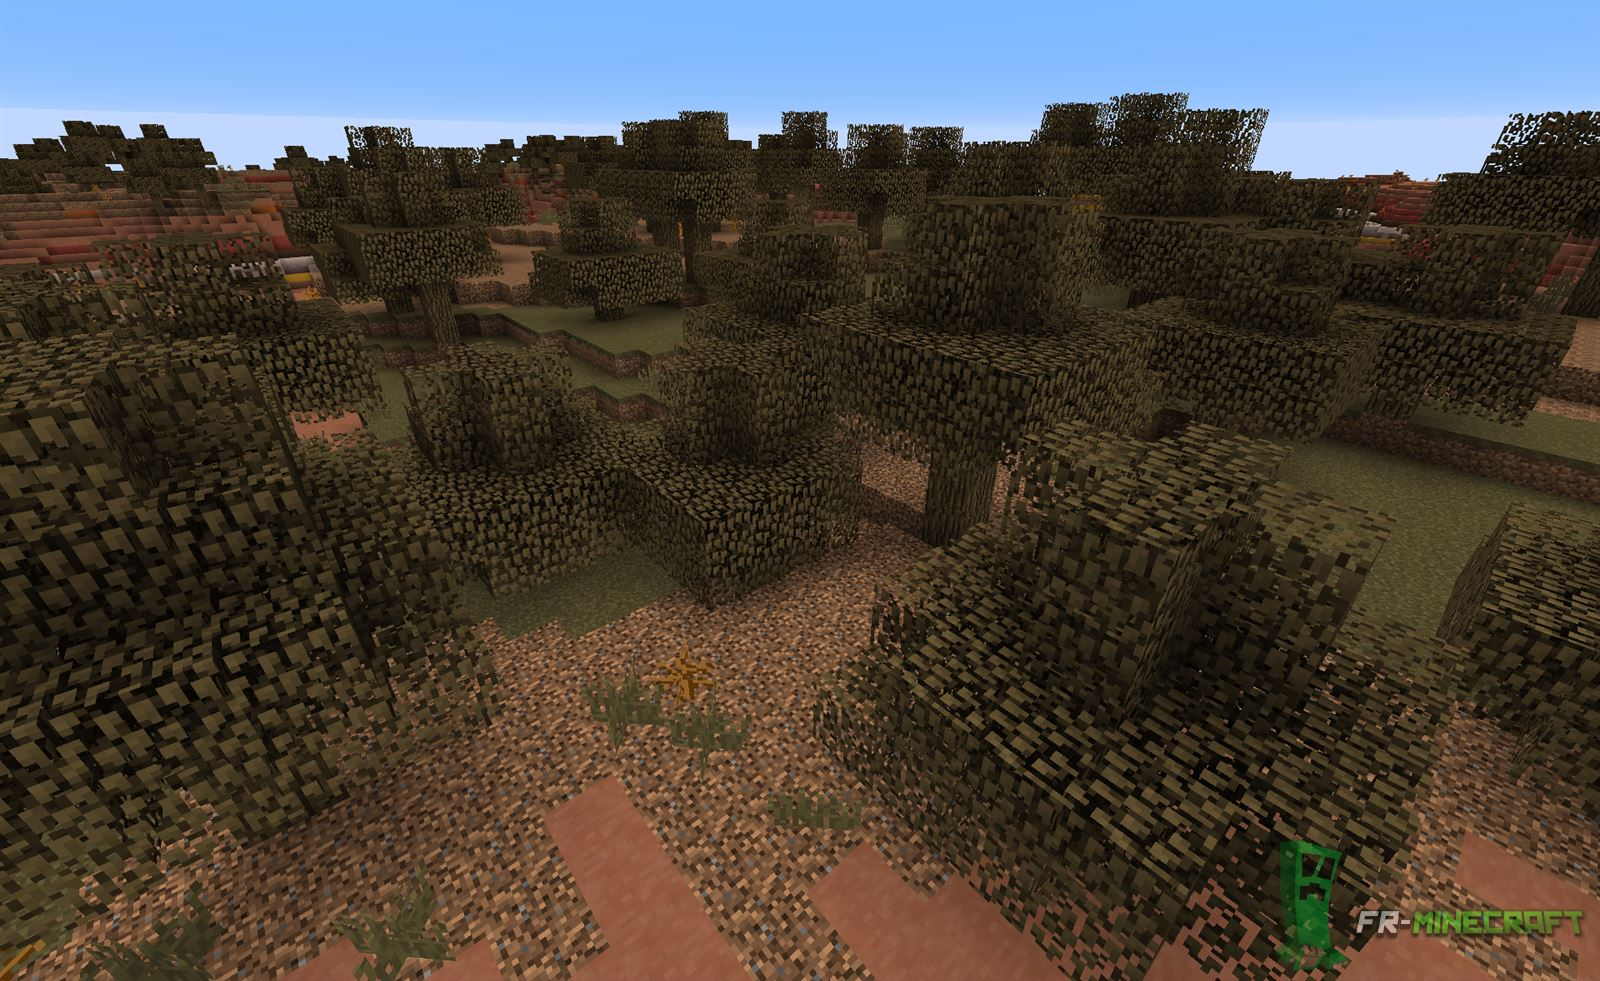 Minecraft Terre Cuite